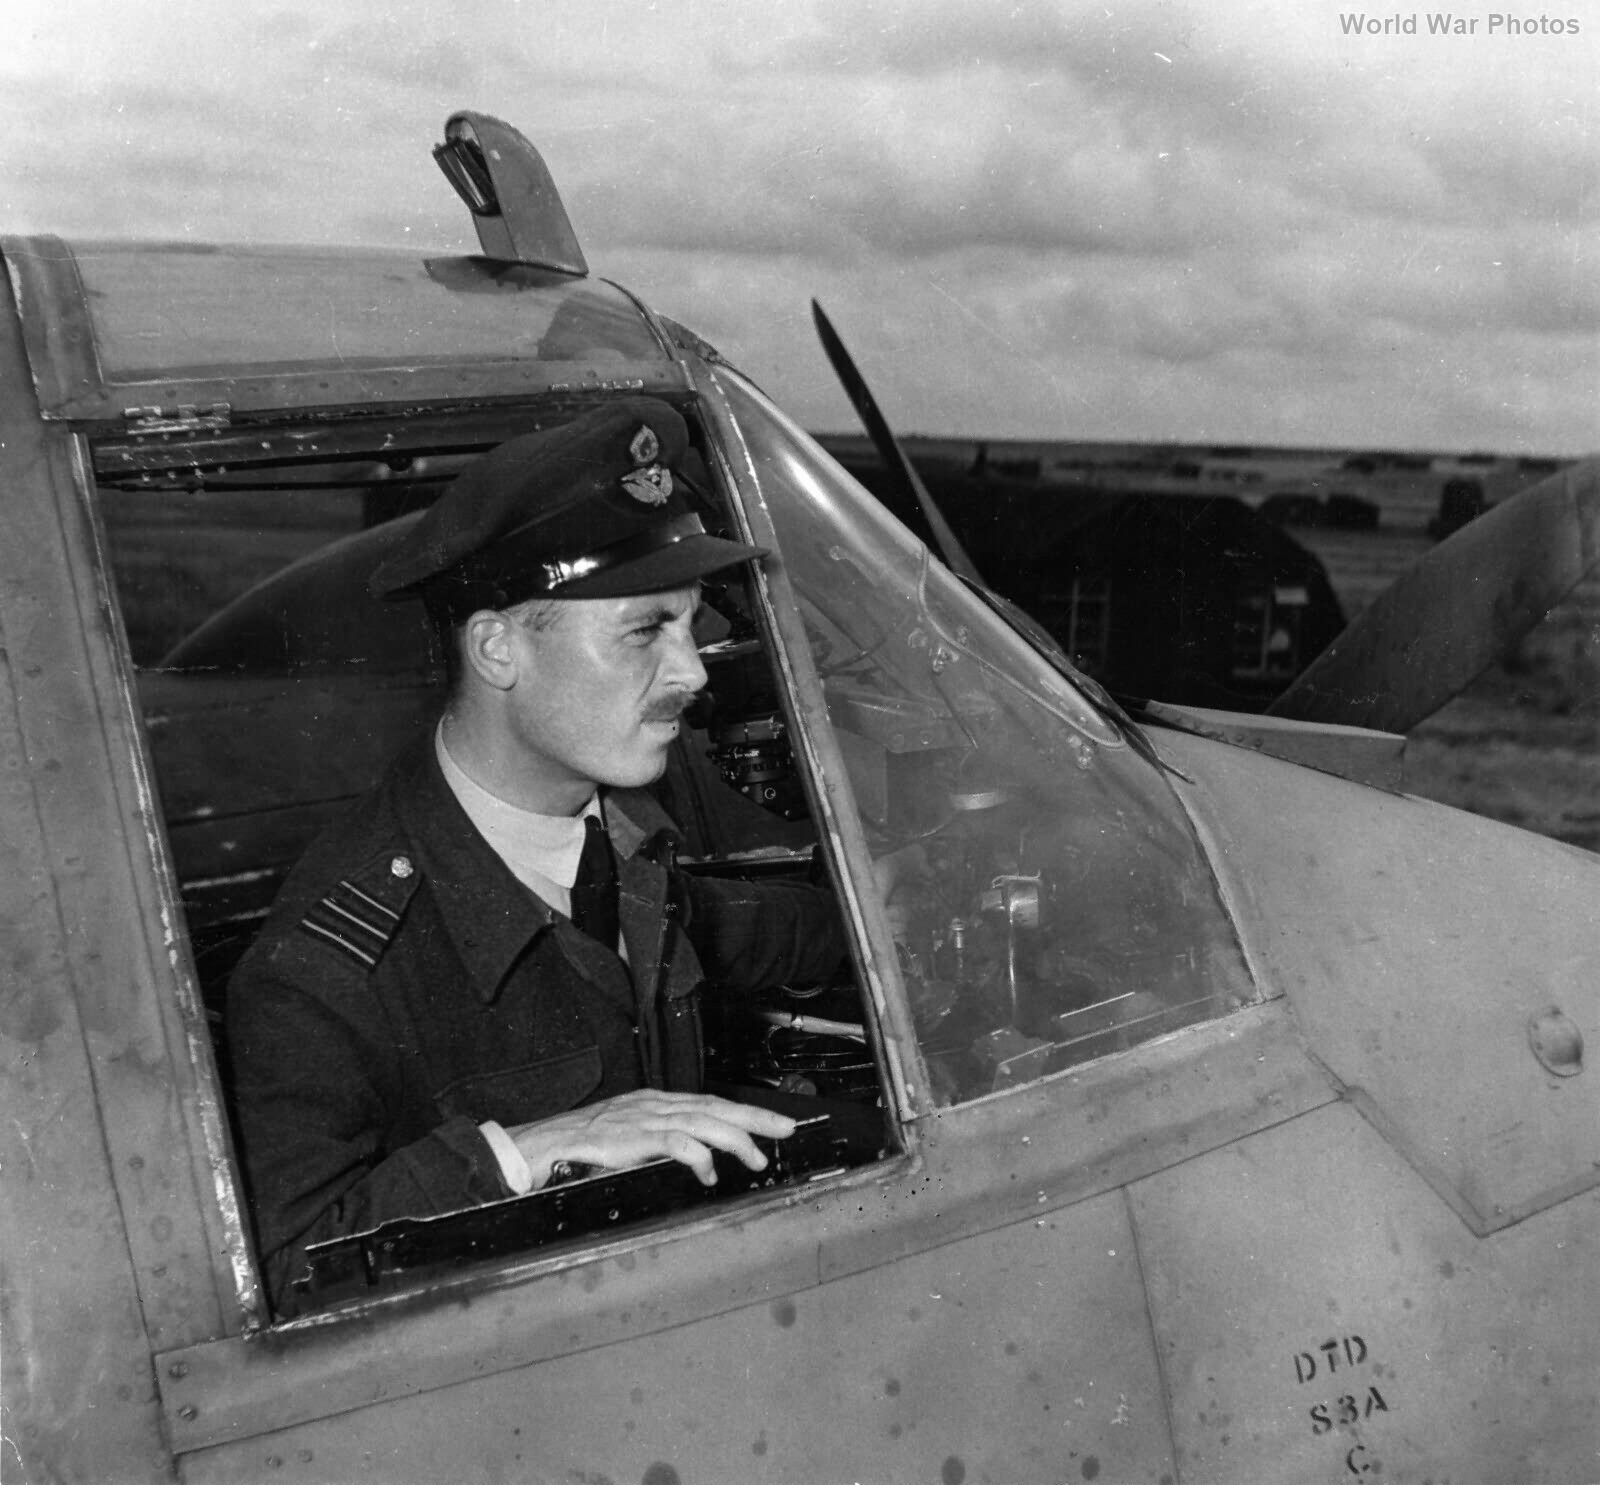 Beaufighter pilot WCdr Gatward 404 Sqn